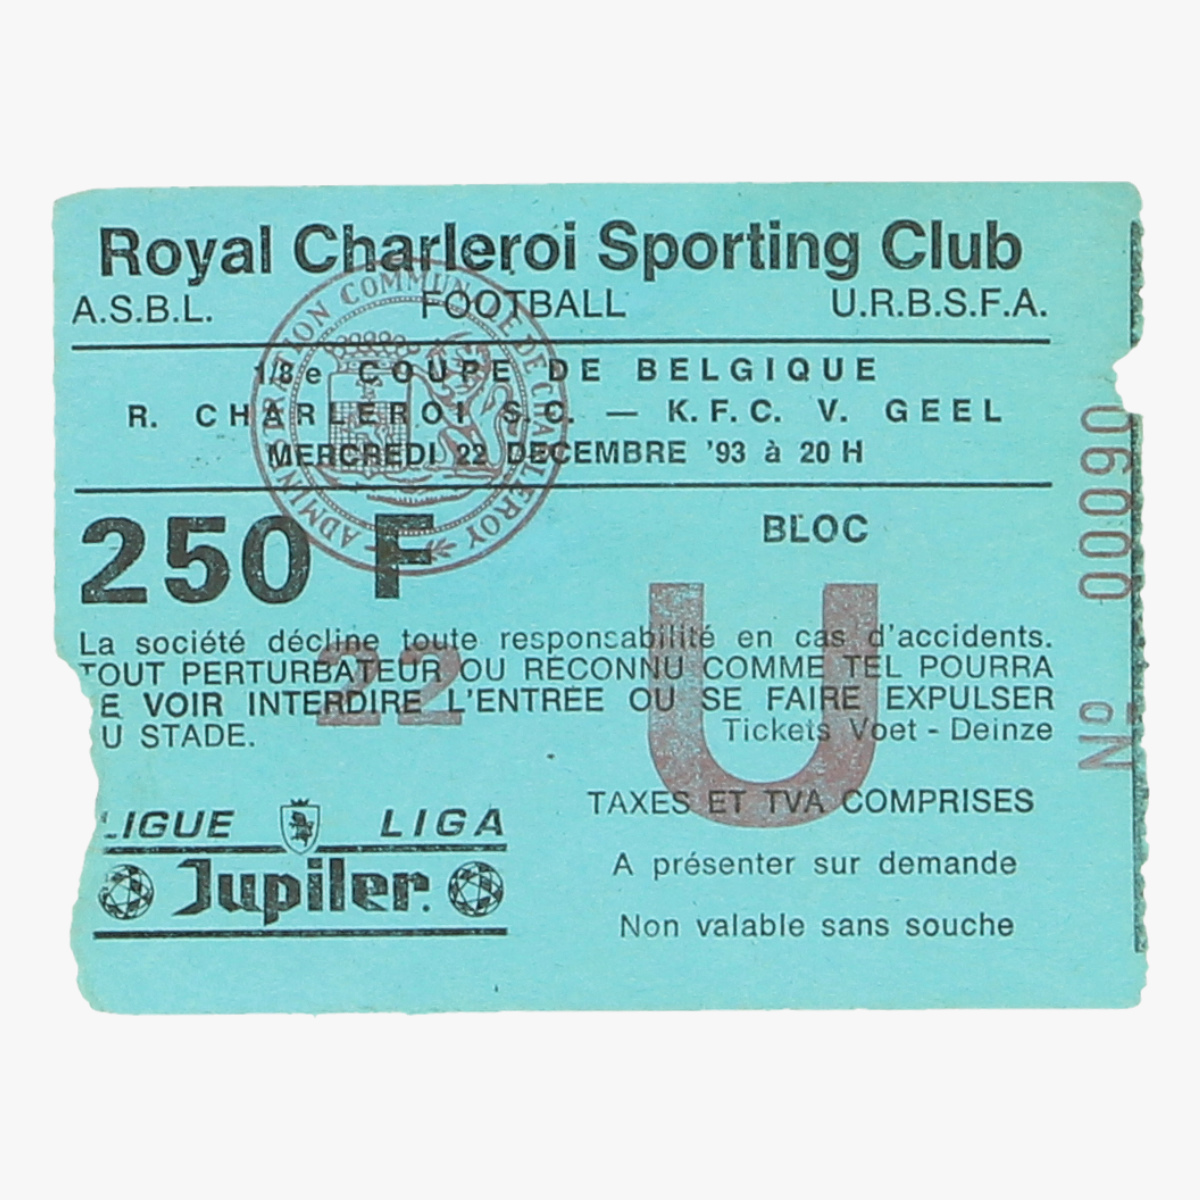 Afbeeldingen van ticket royal charleroi sporting